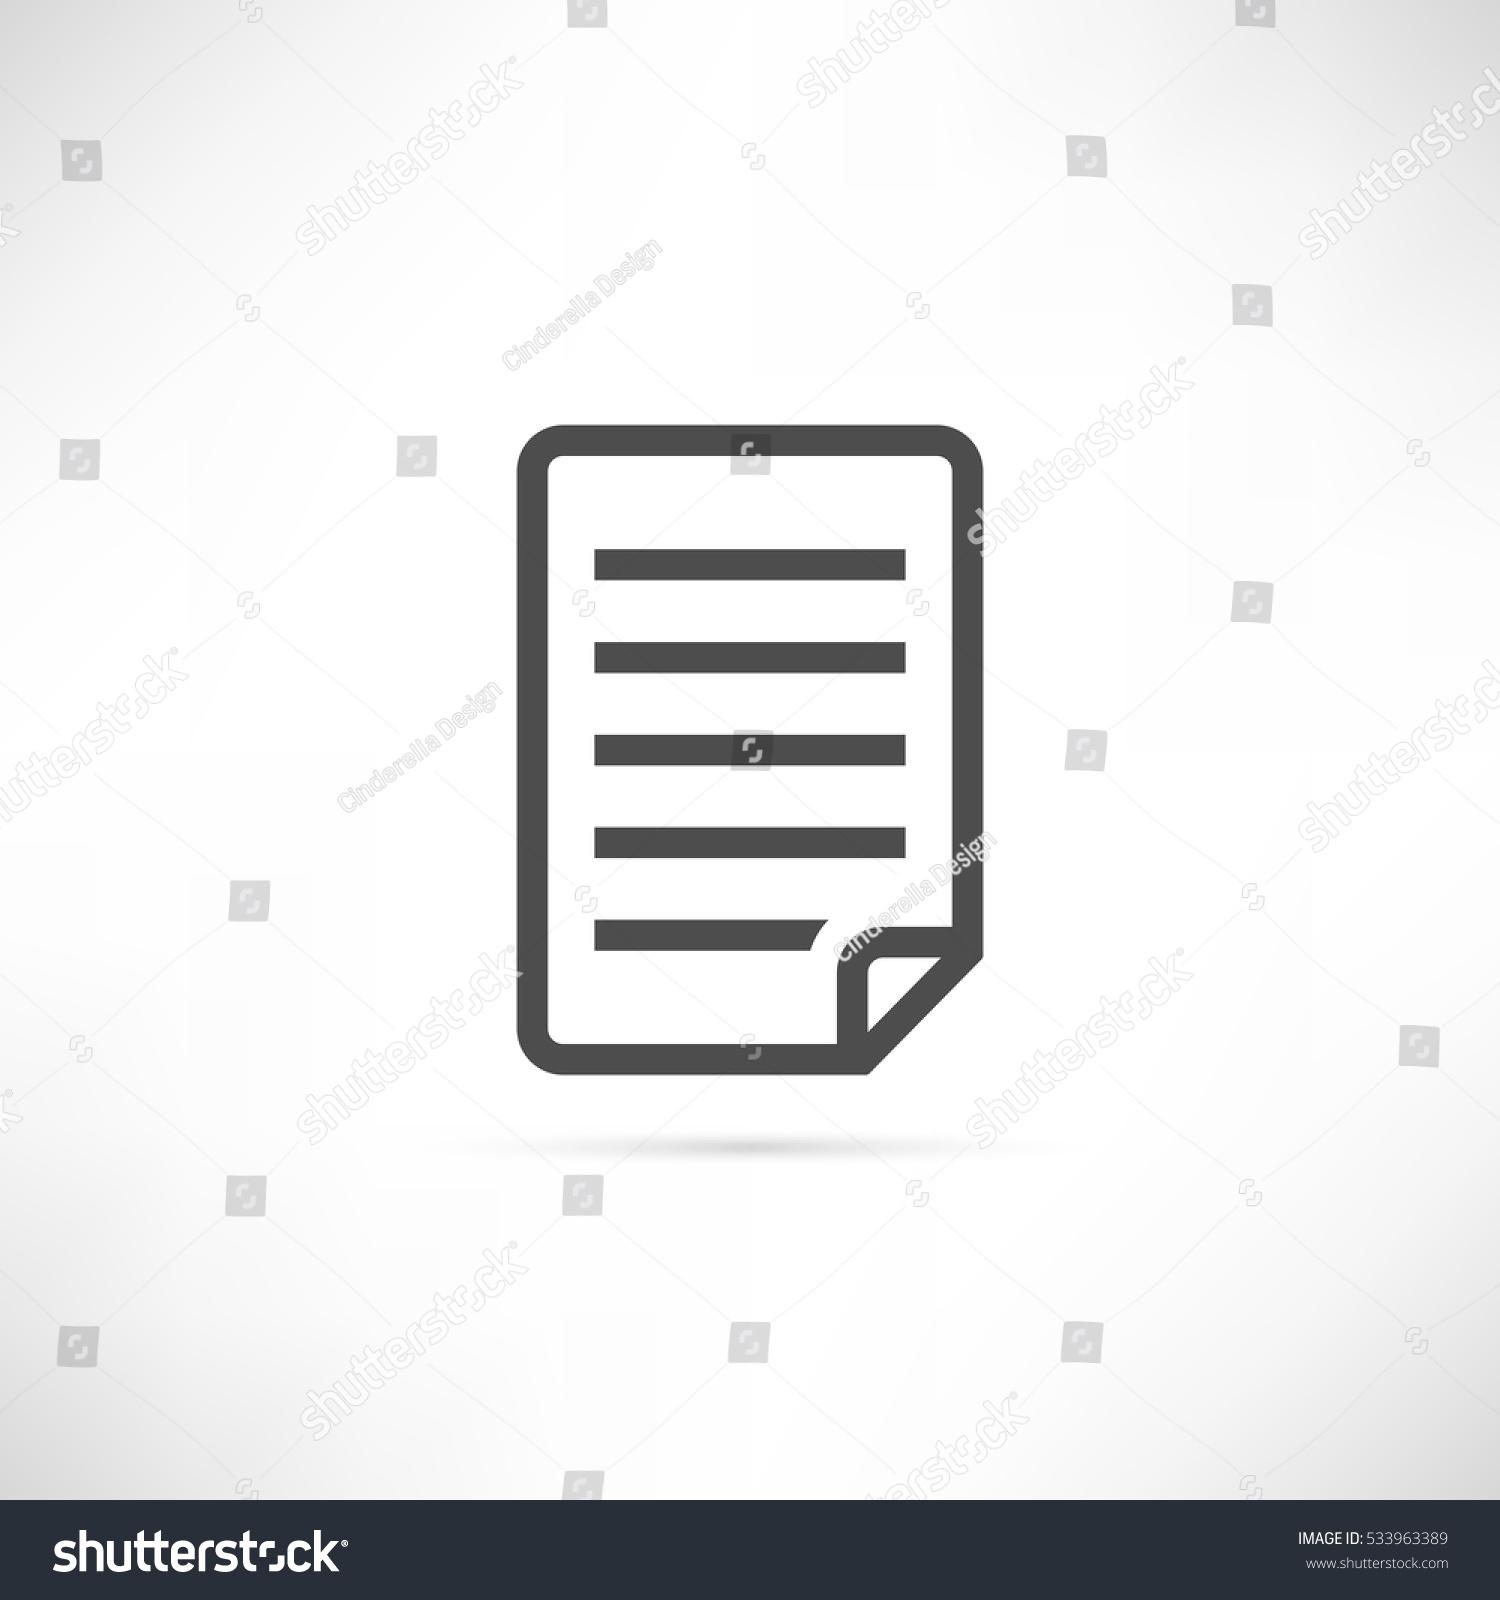 sign in sheet app